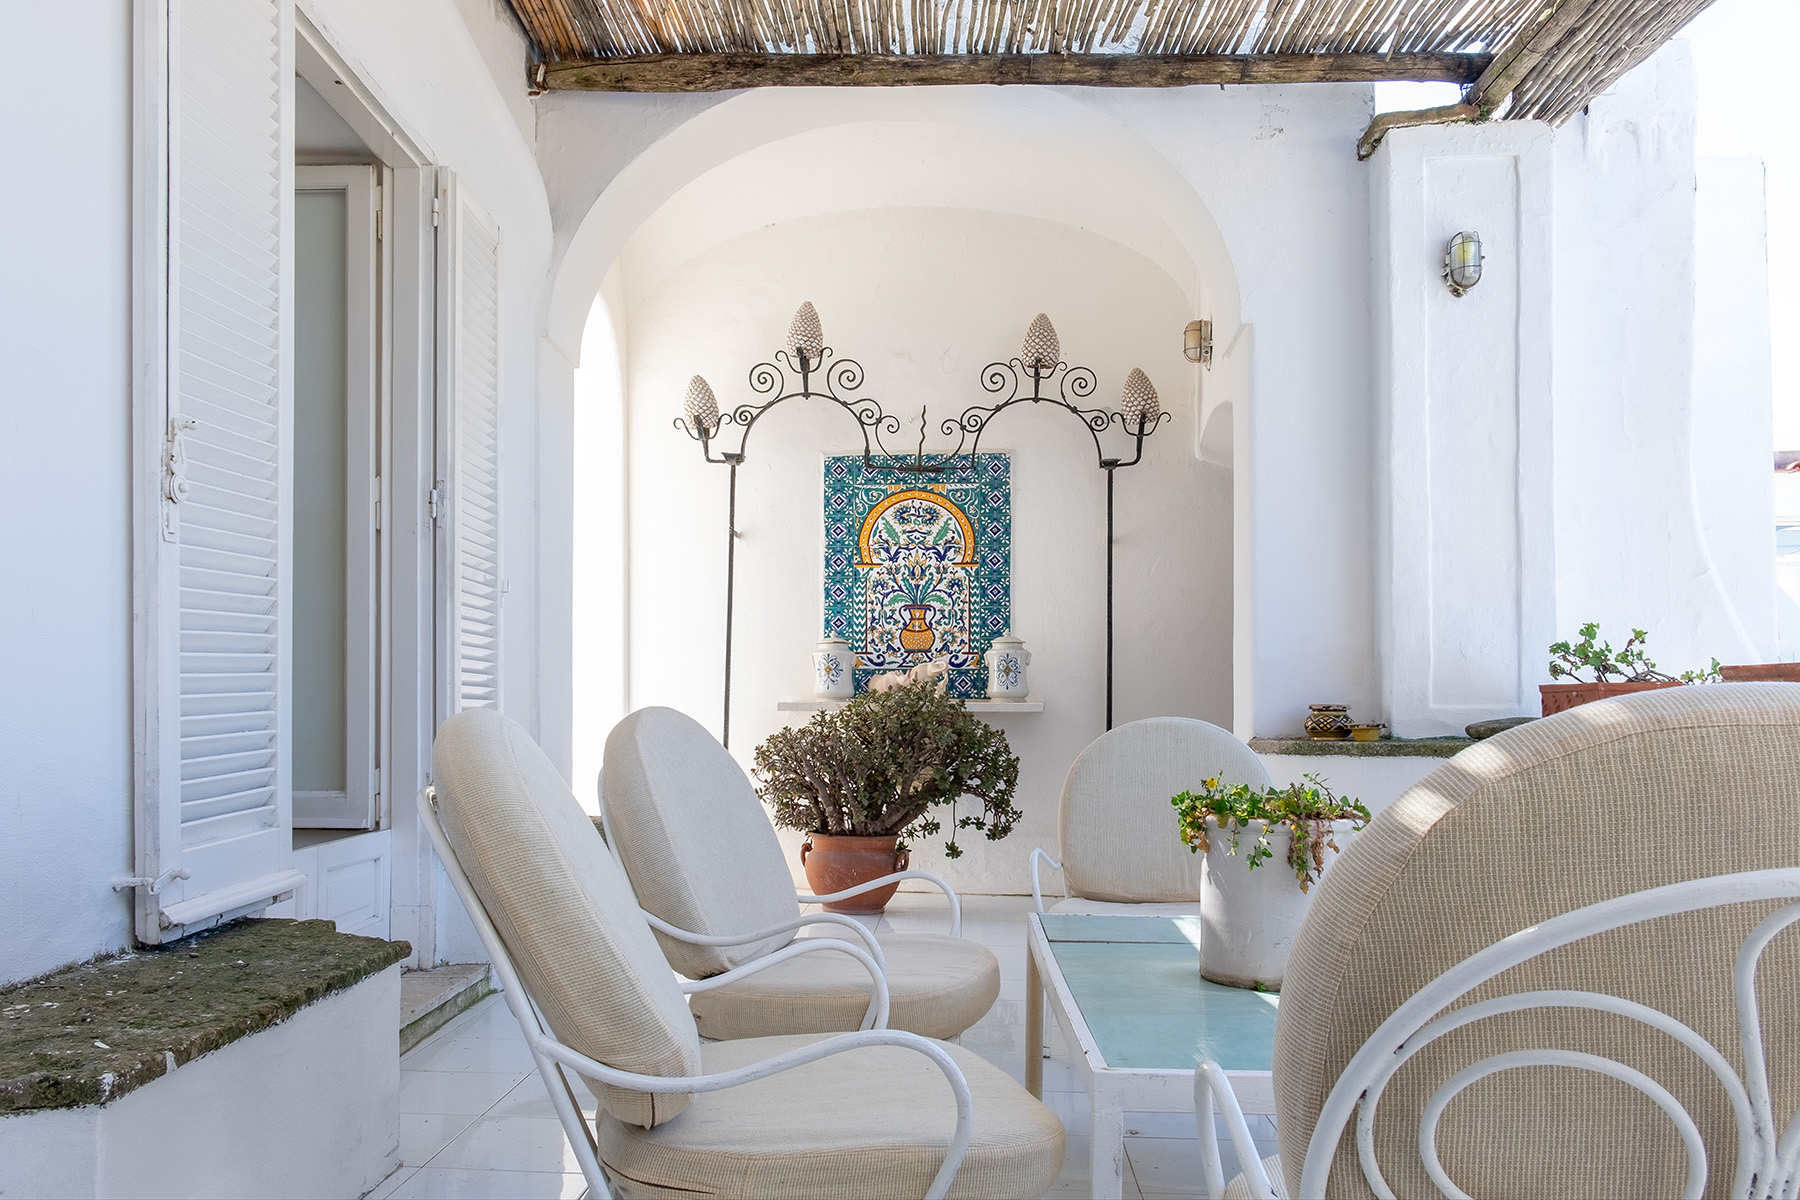 Casa indipendente in Vendita a Capri: 5 locali, 300 mq - Foto 9